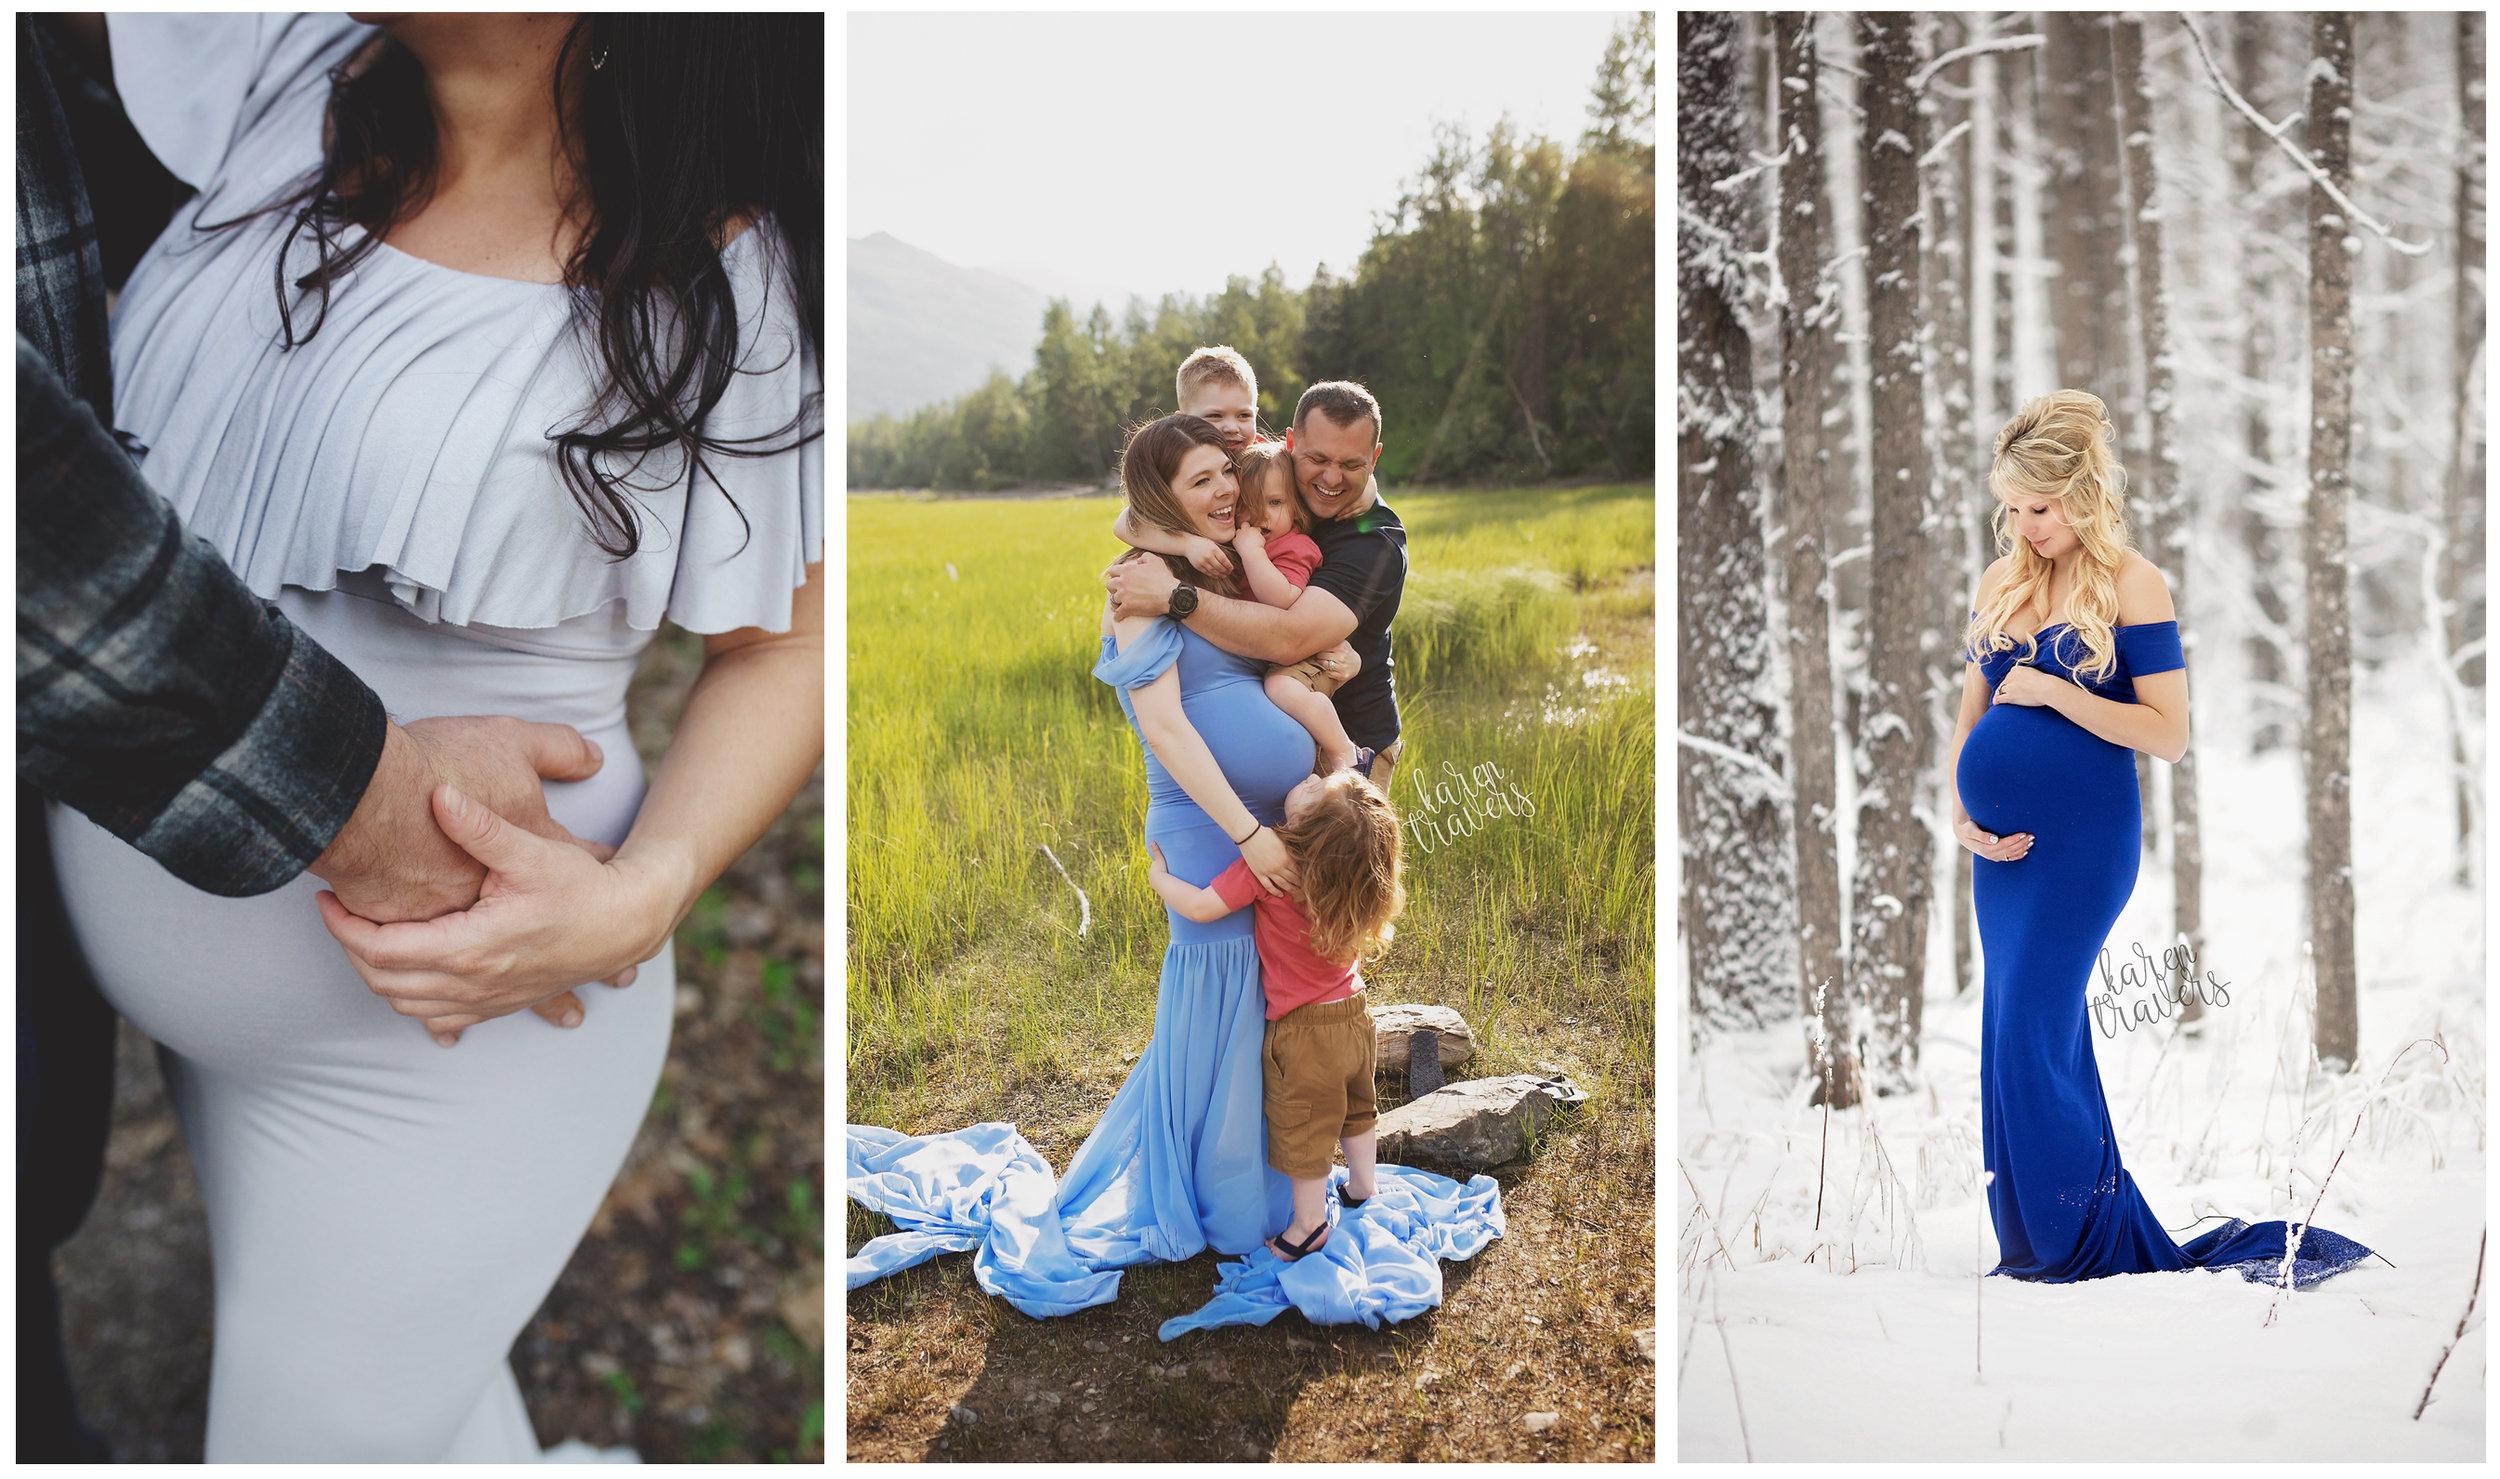 anchorage-maternity-photographer-6.jpg